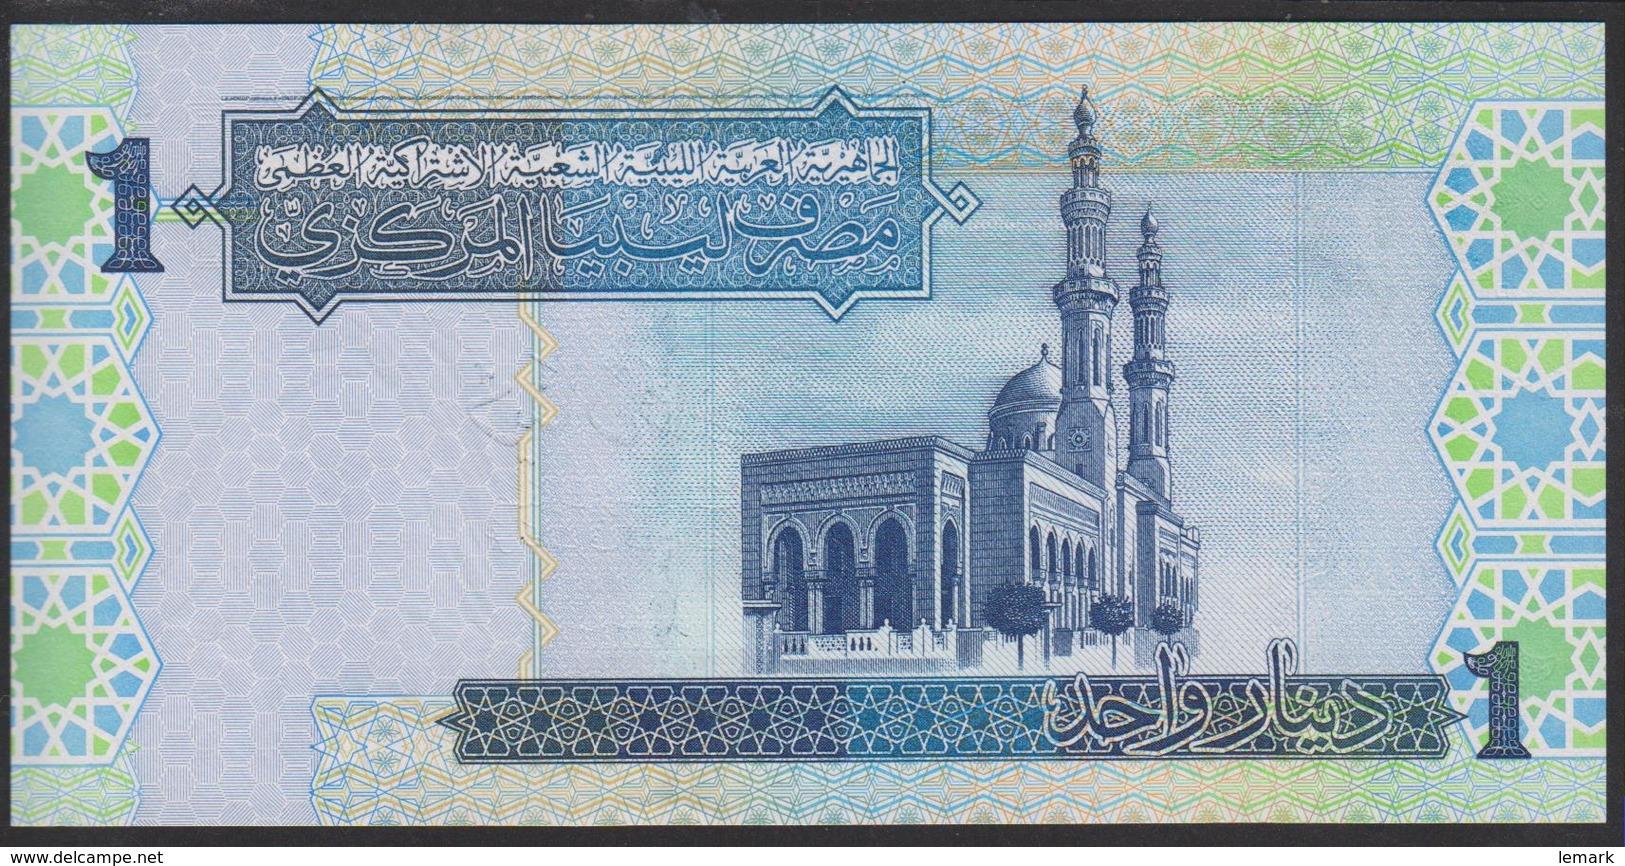 Libya 1 Dinar 2004 P68b UNC - Libye